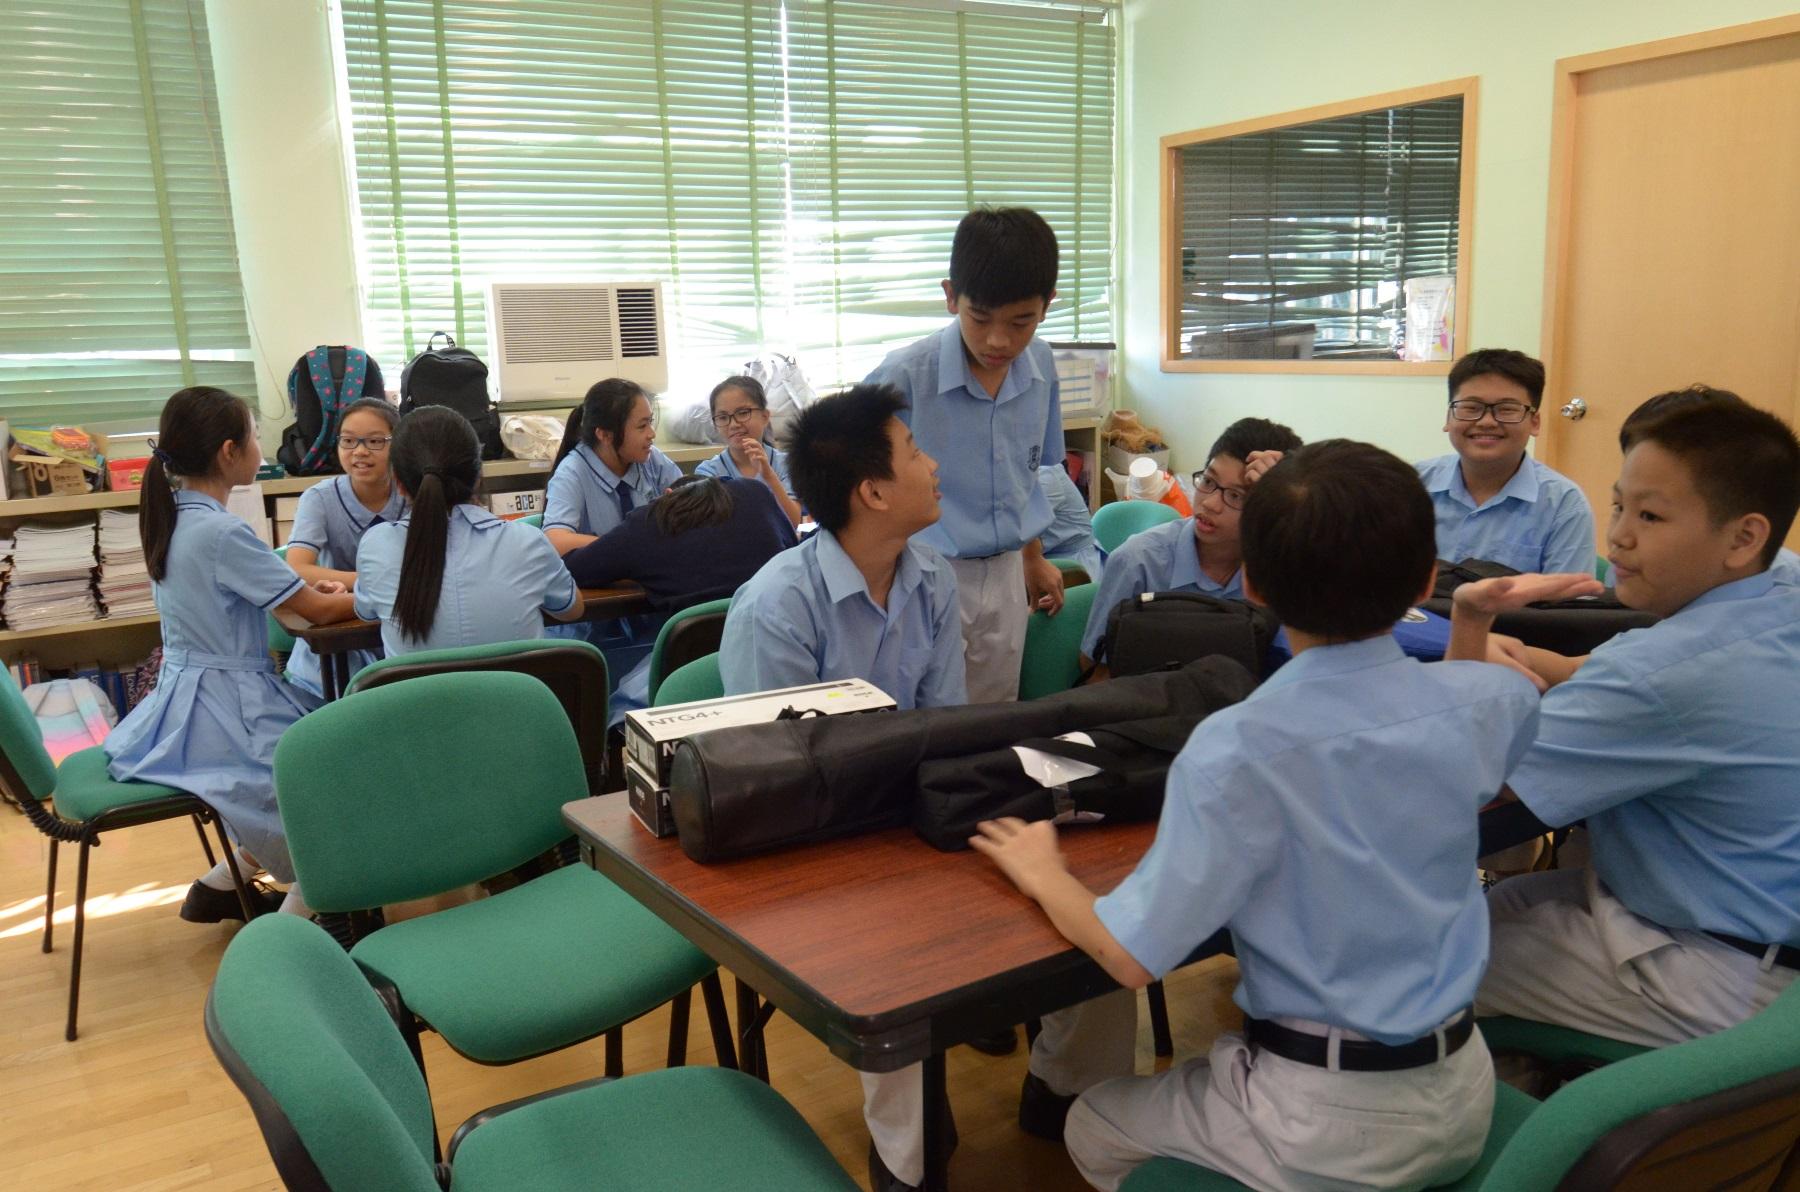 http://www.npc.edu.hk/sites/default/files/dsc_8613.jpg